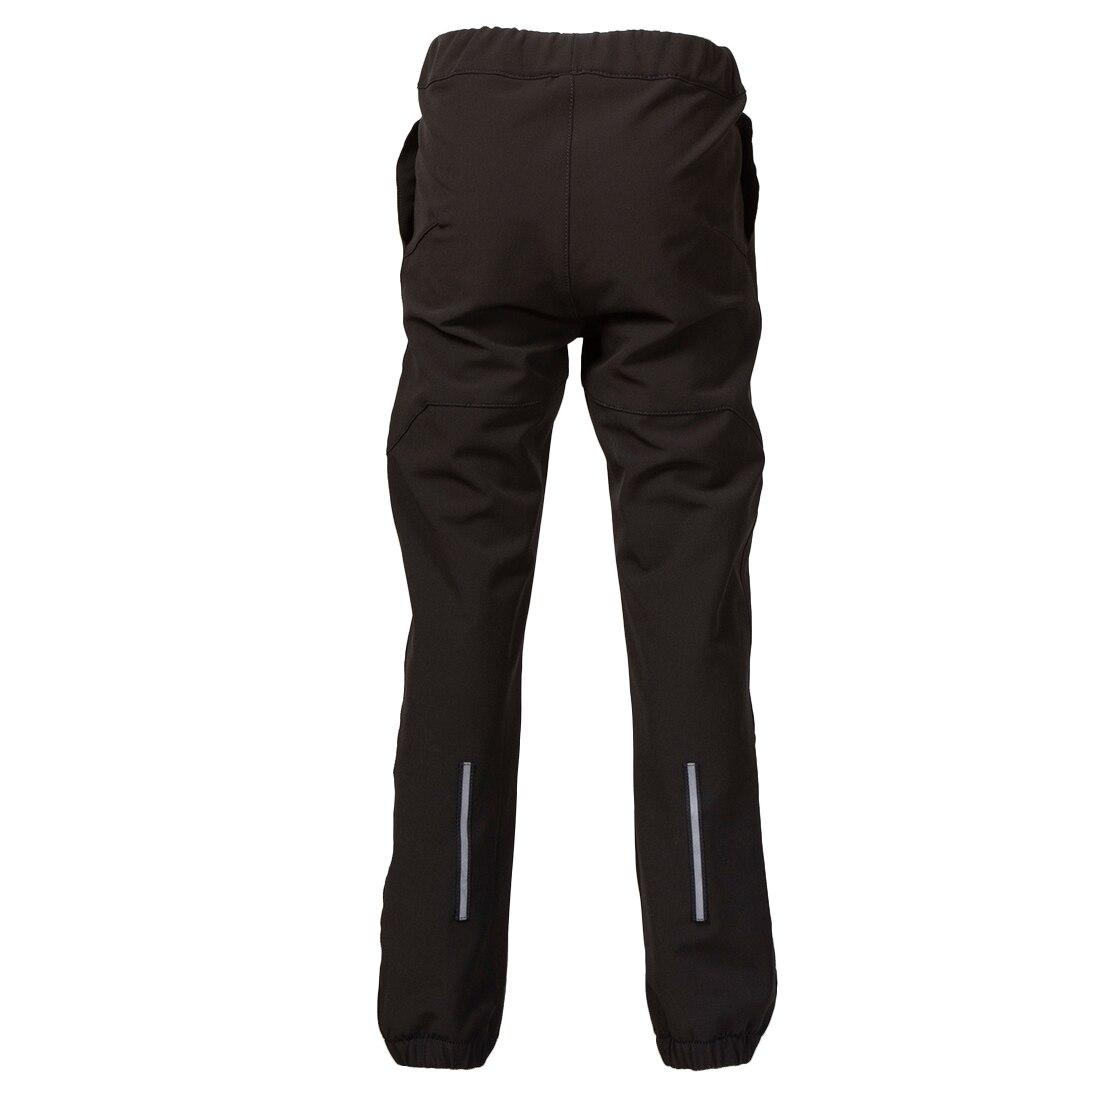 Ruffen Lt Softshell Kids Pants